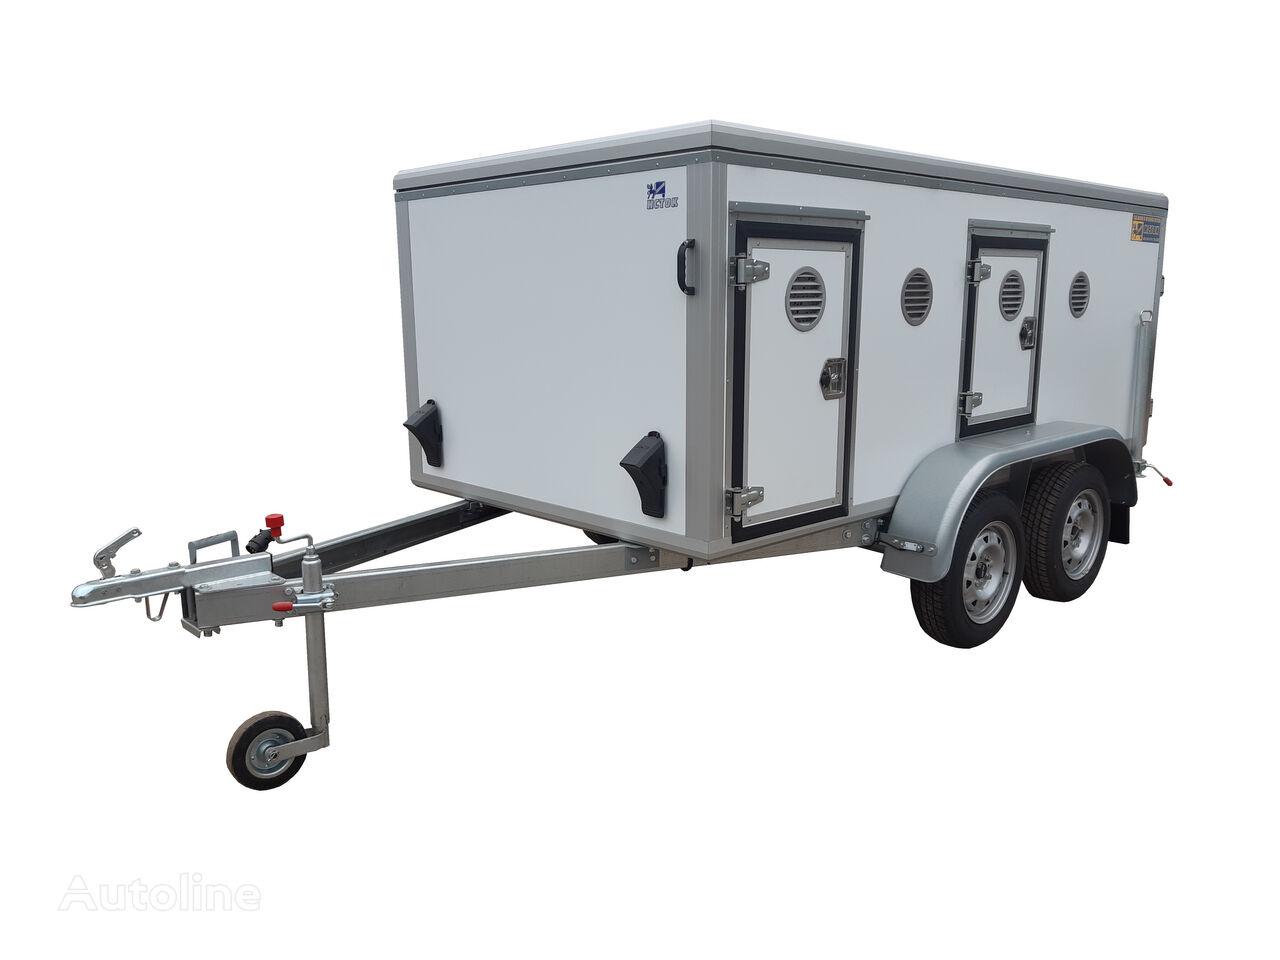 ISTOK ISTOK 3792M4 closed box trailer